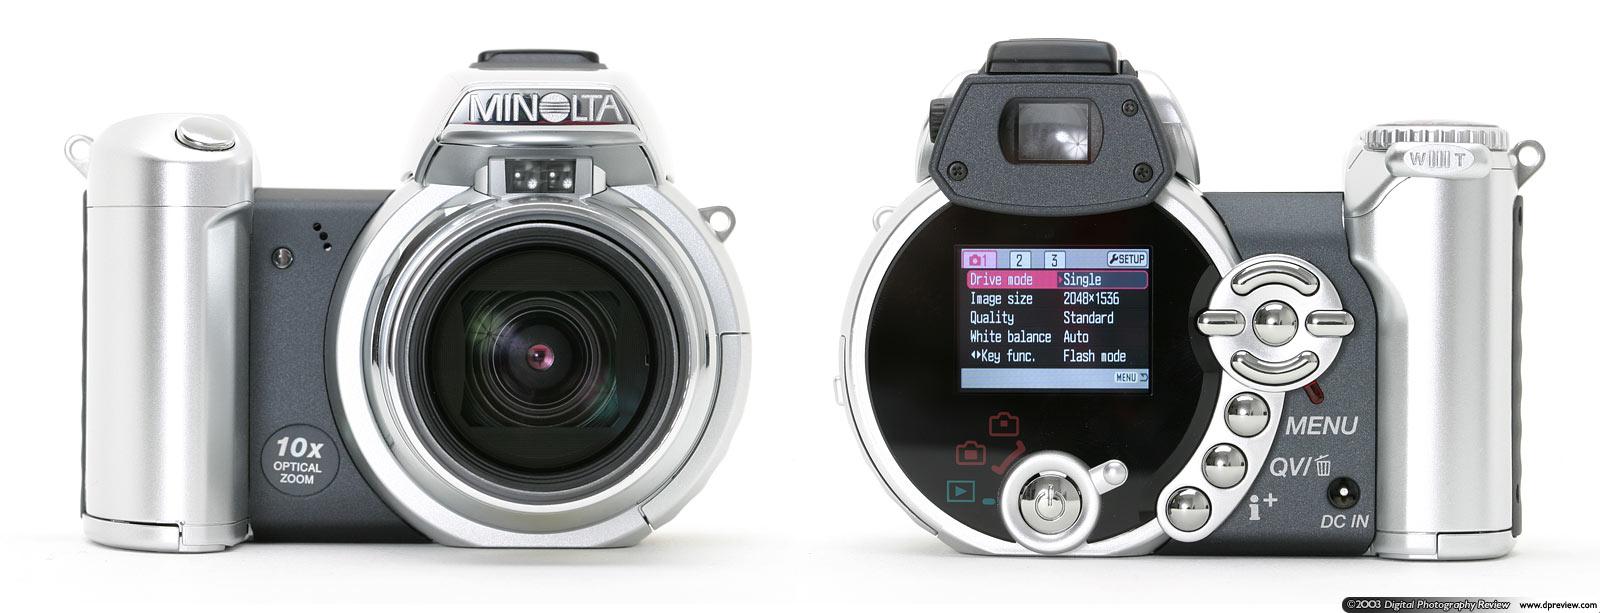 minolta introduces a breakthrough in digital camera design and engineering - Minolta Digital Camera